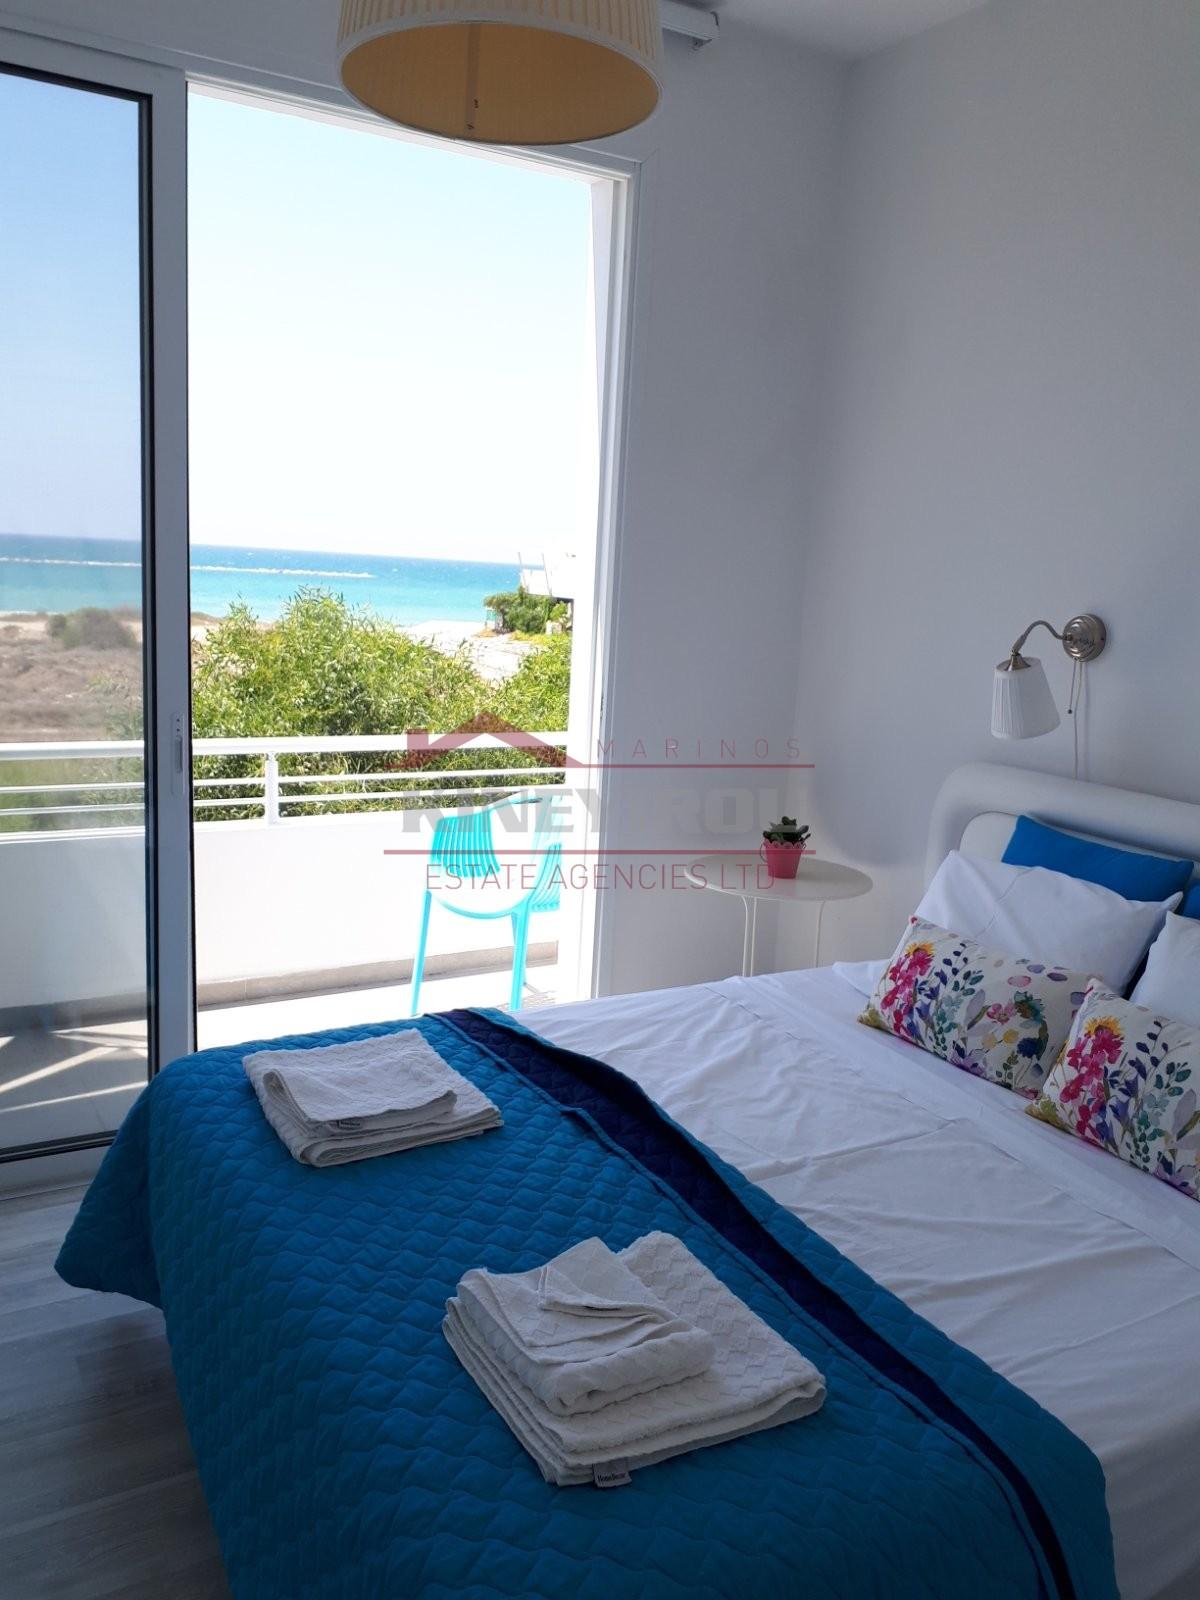 Sea View House 2 Bedroom in Perivolia, Larnaca